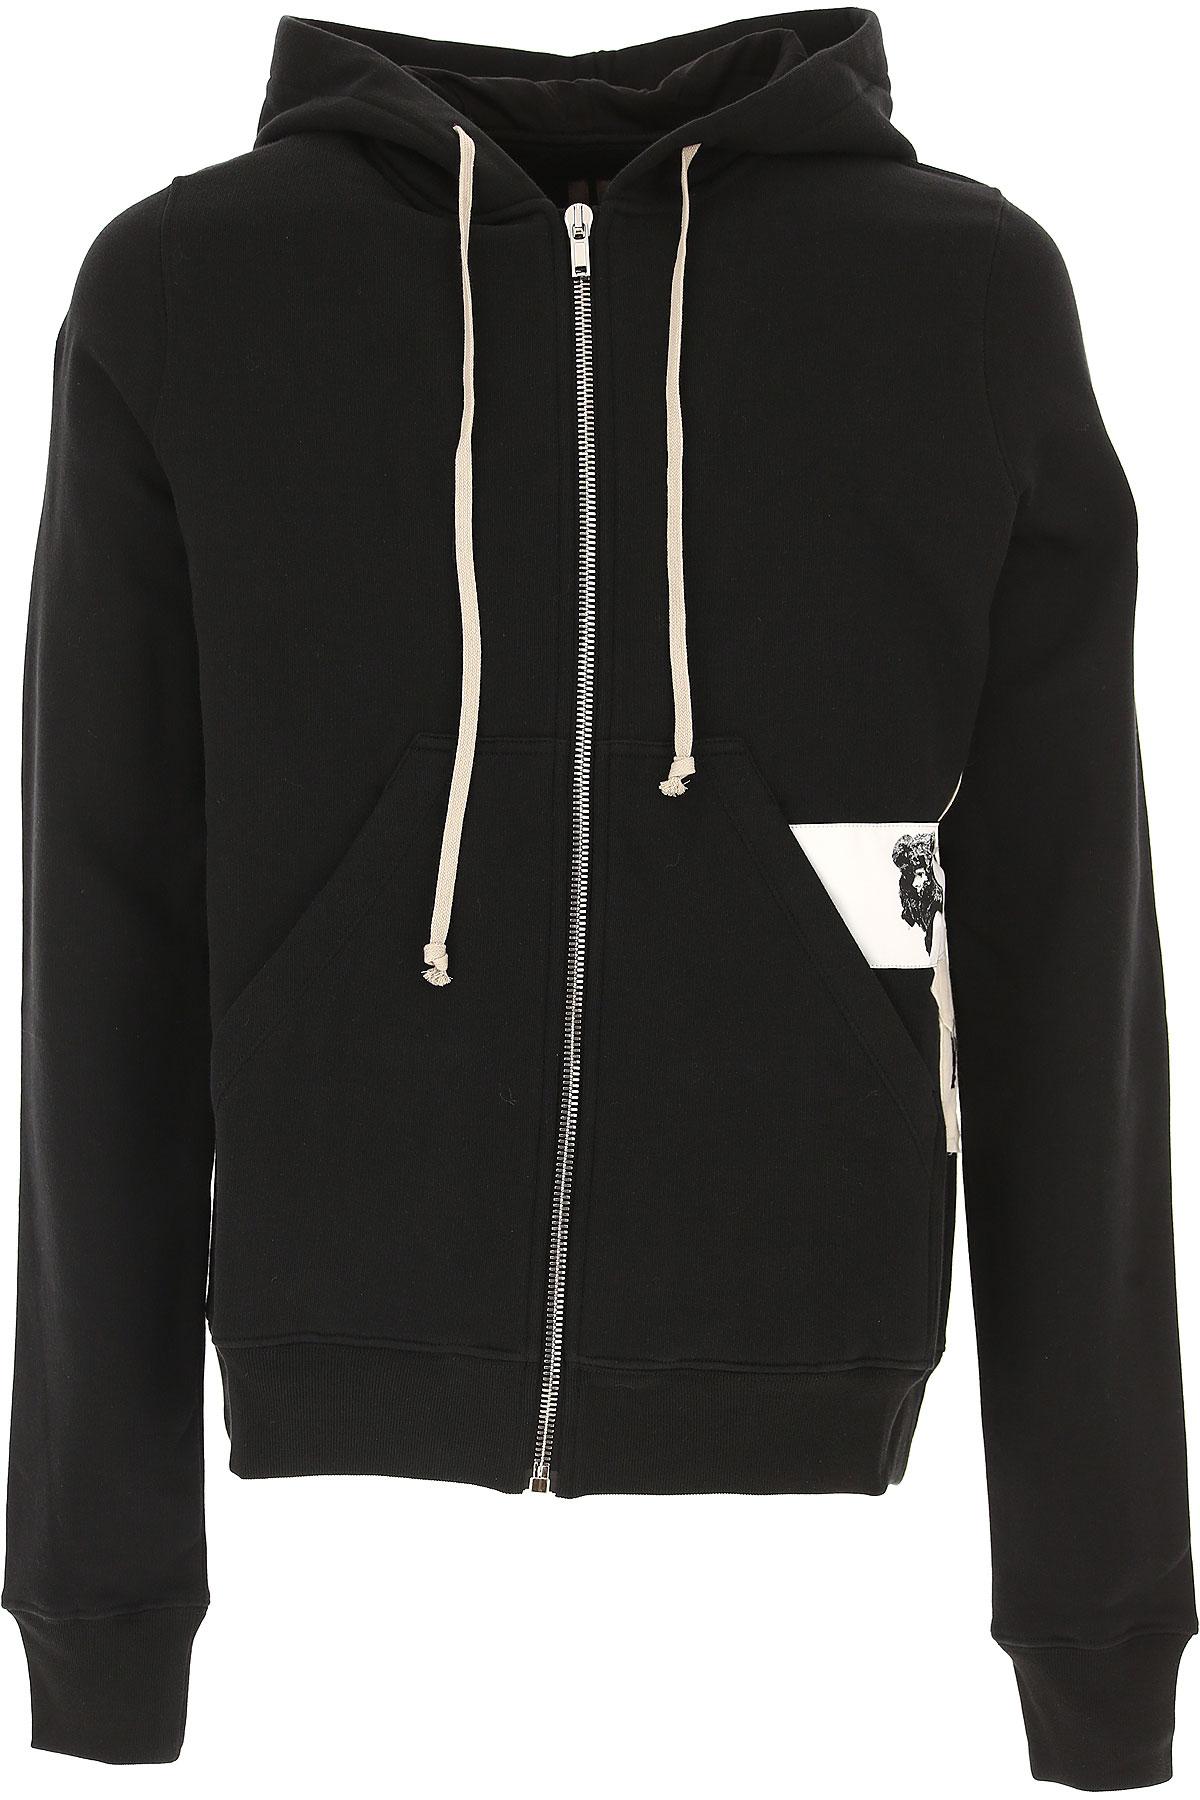 Rick Owens DRKSHDW Sweatshirt for Men On Sale in Outlet, Black, Cotton, 2017, L M USA-439424